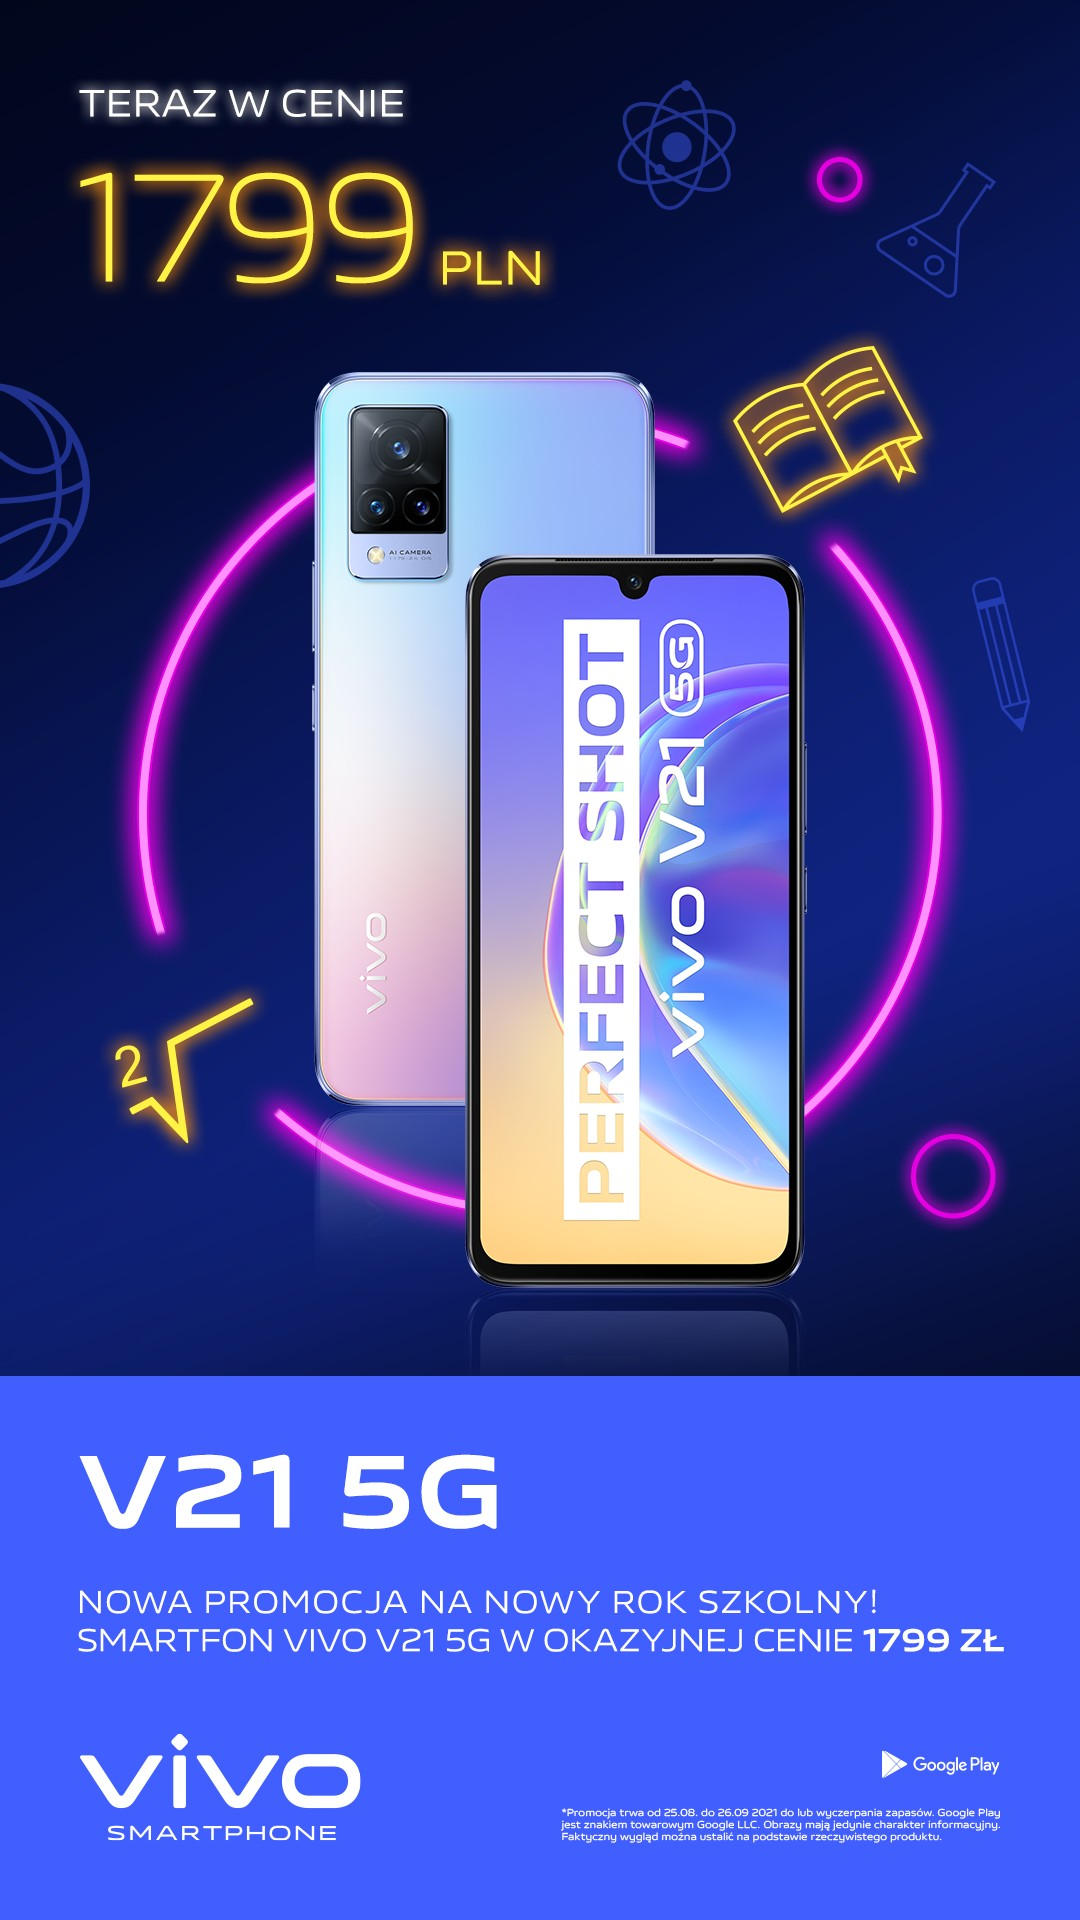 V21 5G promo